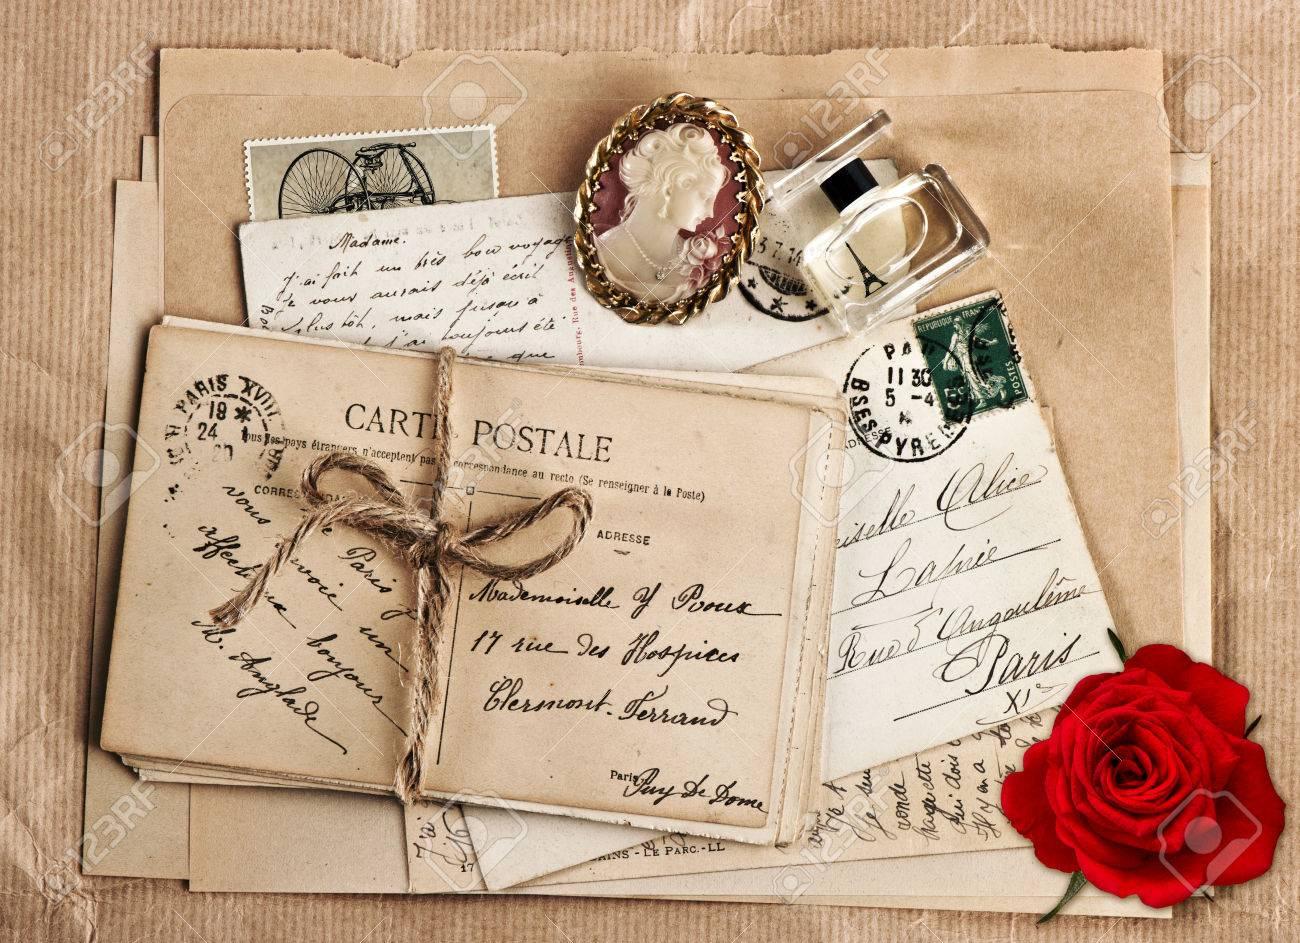 Stari romantični dnevnici,pisma,albumi,knjige - Page 9 29758577-old-french-post-cards-nostalgic-accessories-and-rose-flower-vintage-sentimental-background-Valentine-Stock-Photo